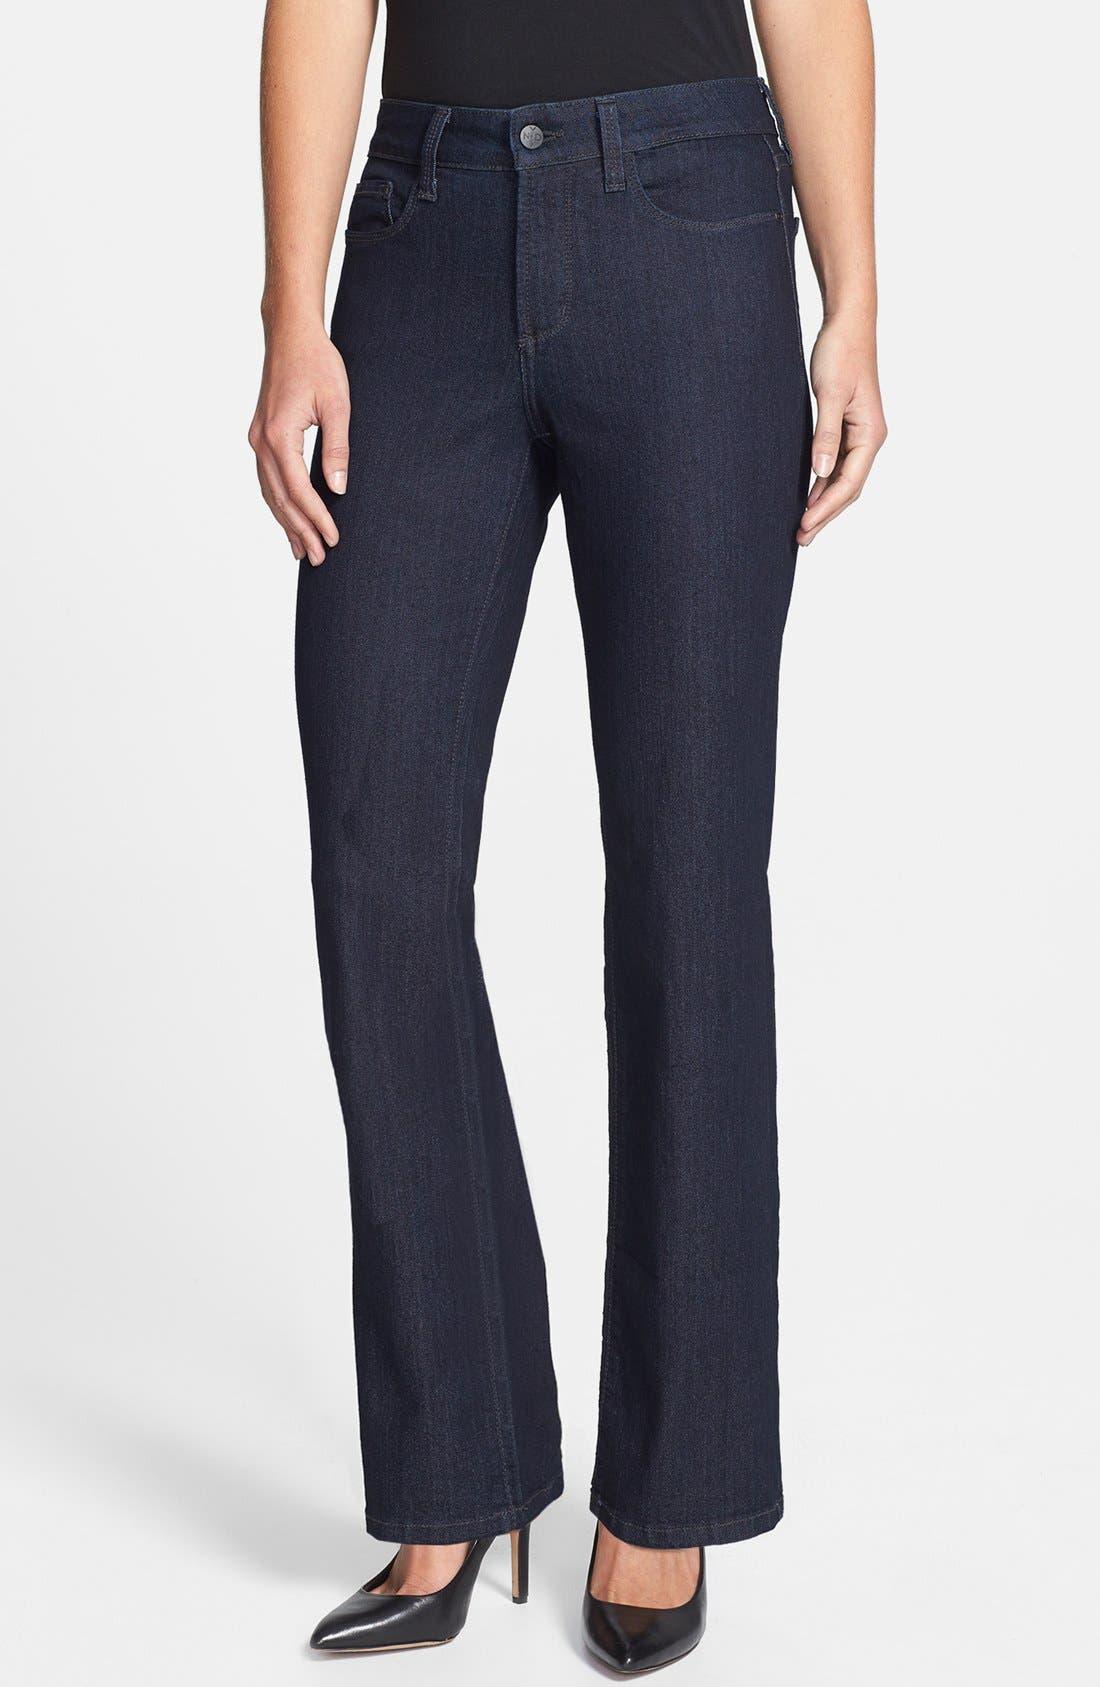 Main Image - NYDJ 'Marilyn' Straight Leg Jeans (Dark Enzyme) (Petite)